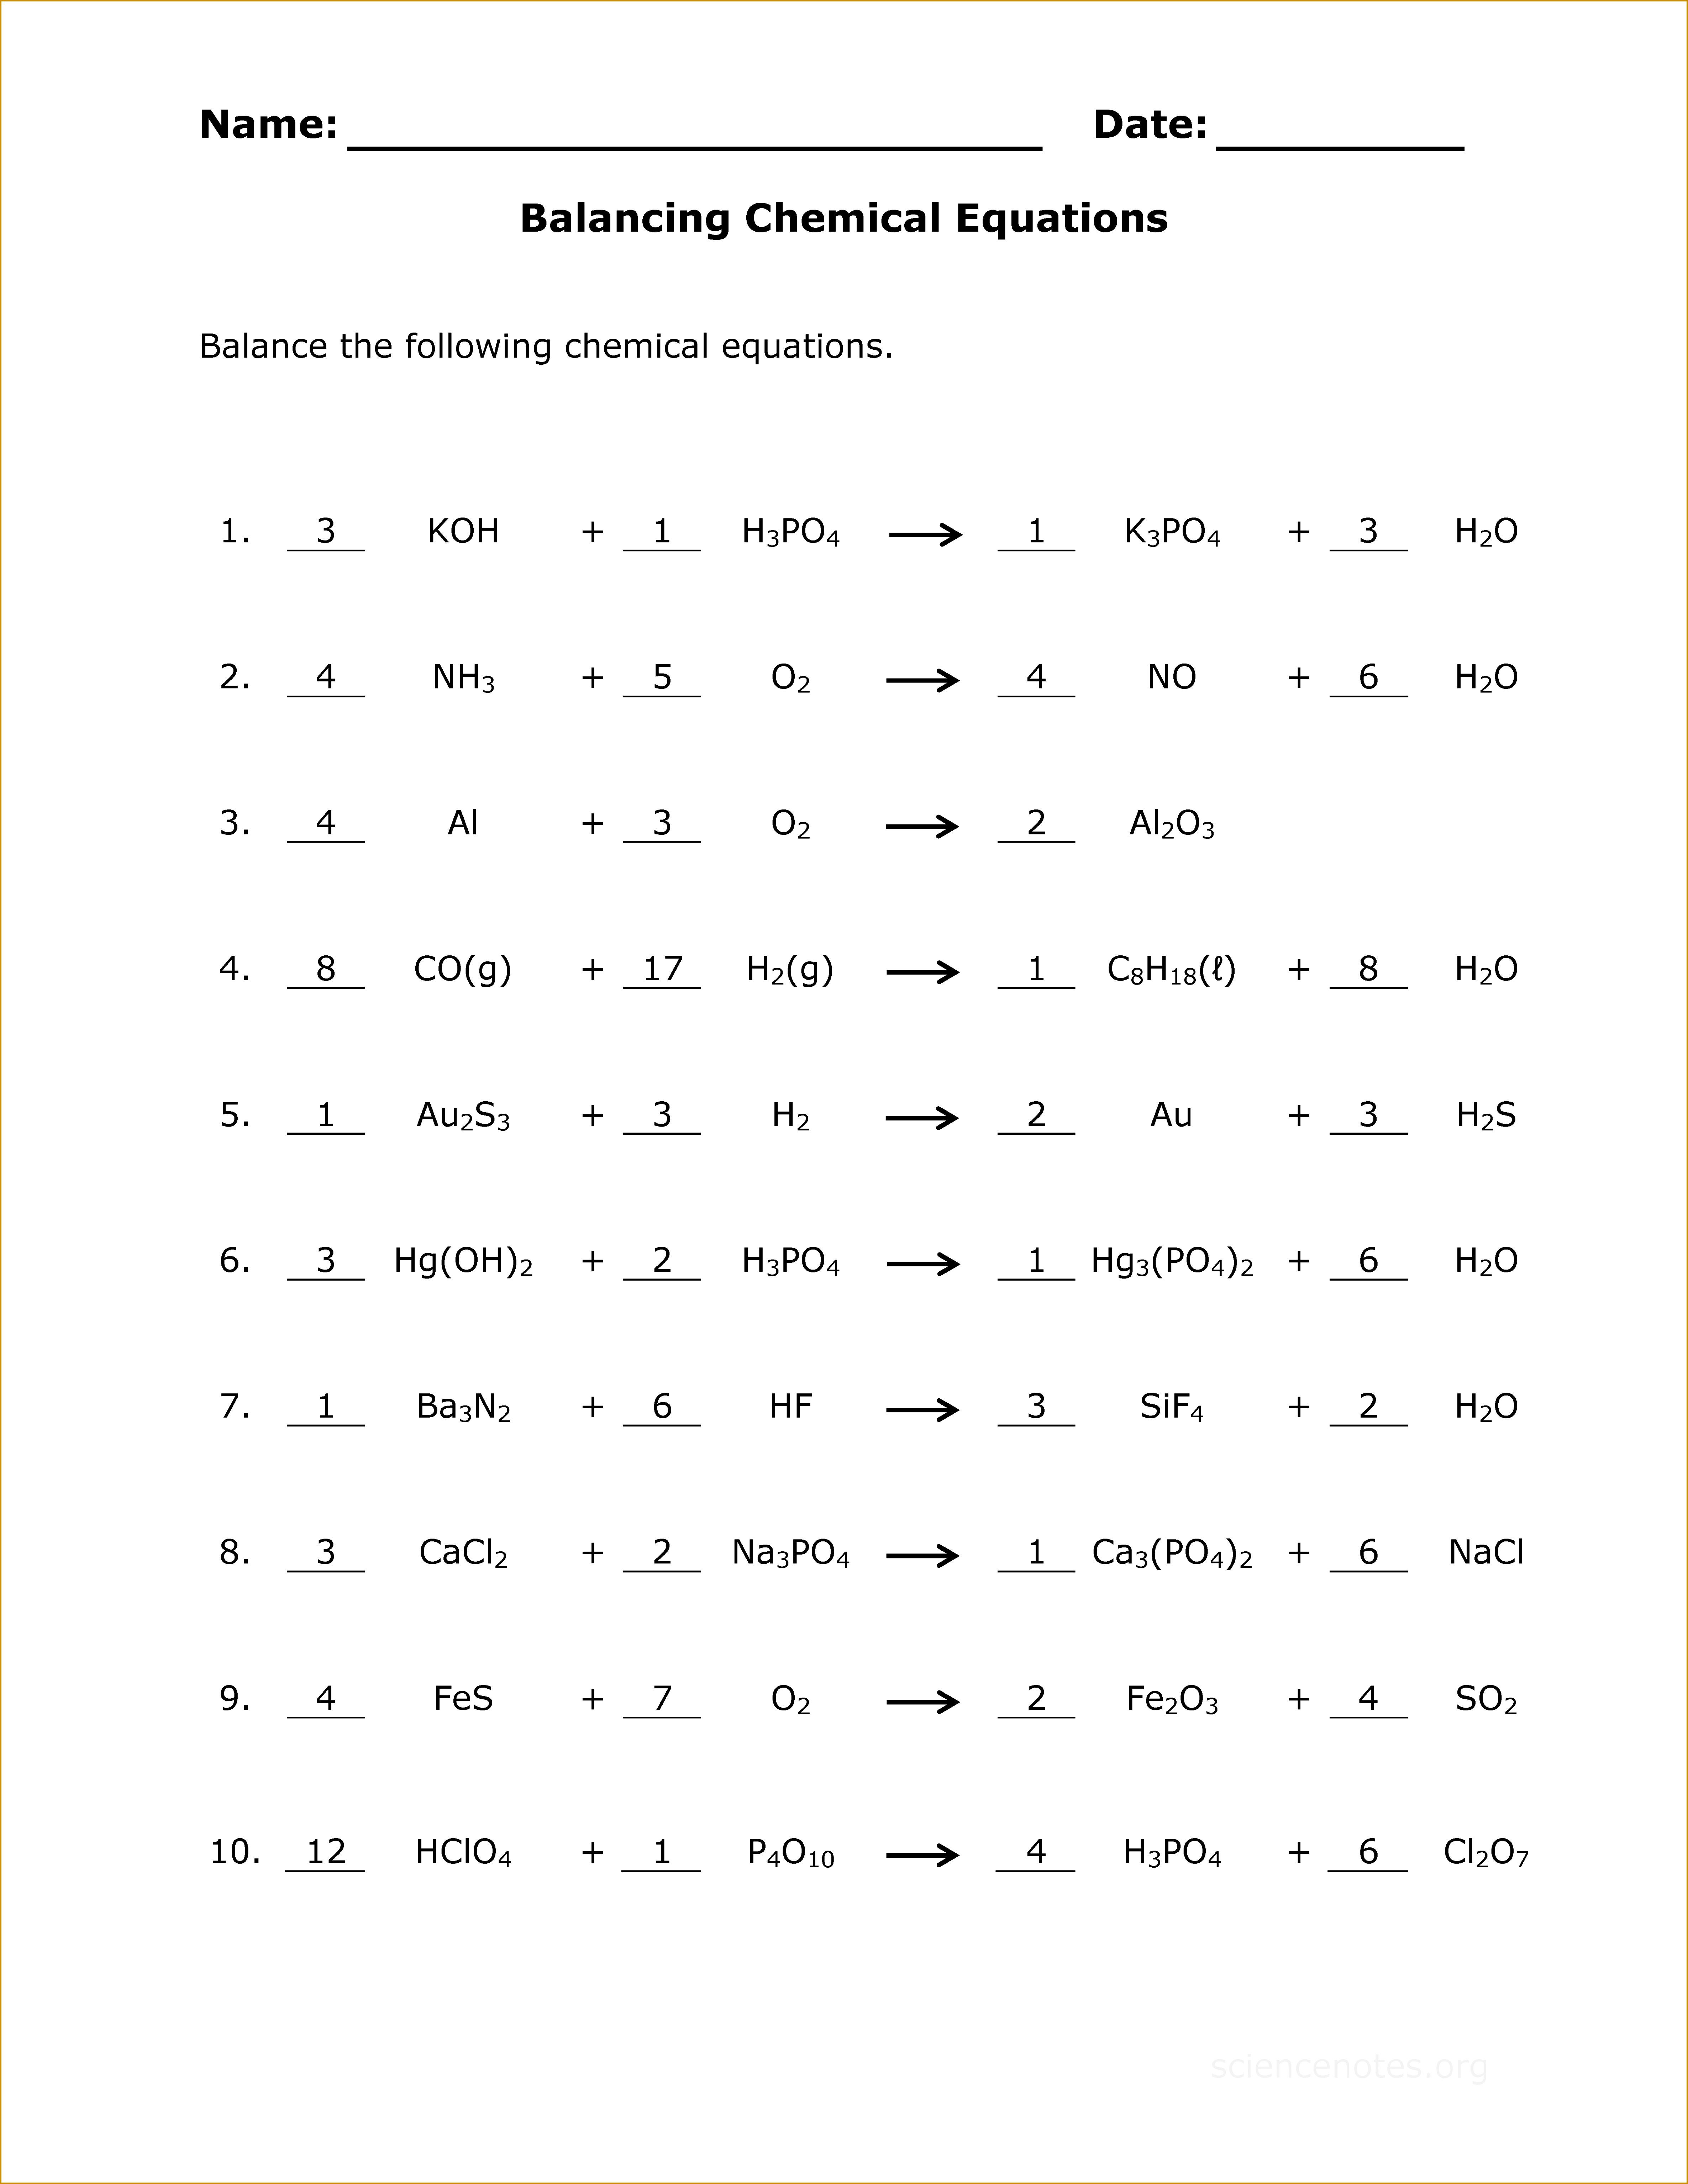 balancing chemical equations worksheet Google Search 61384743